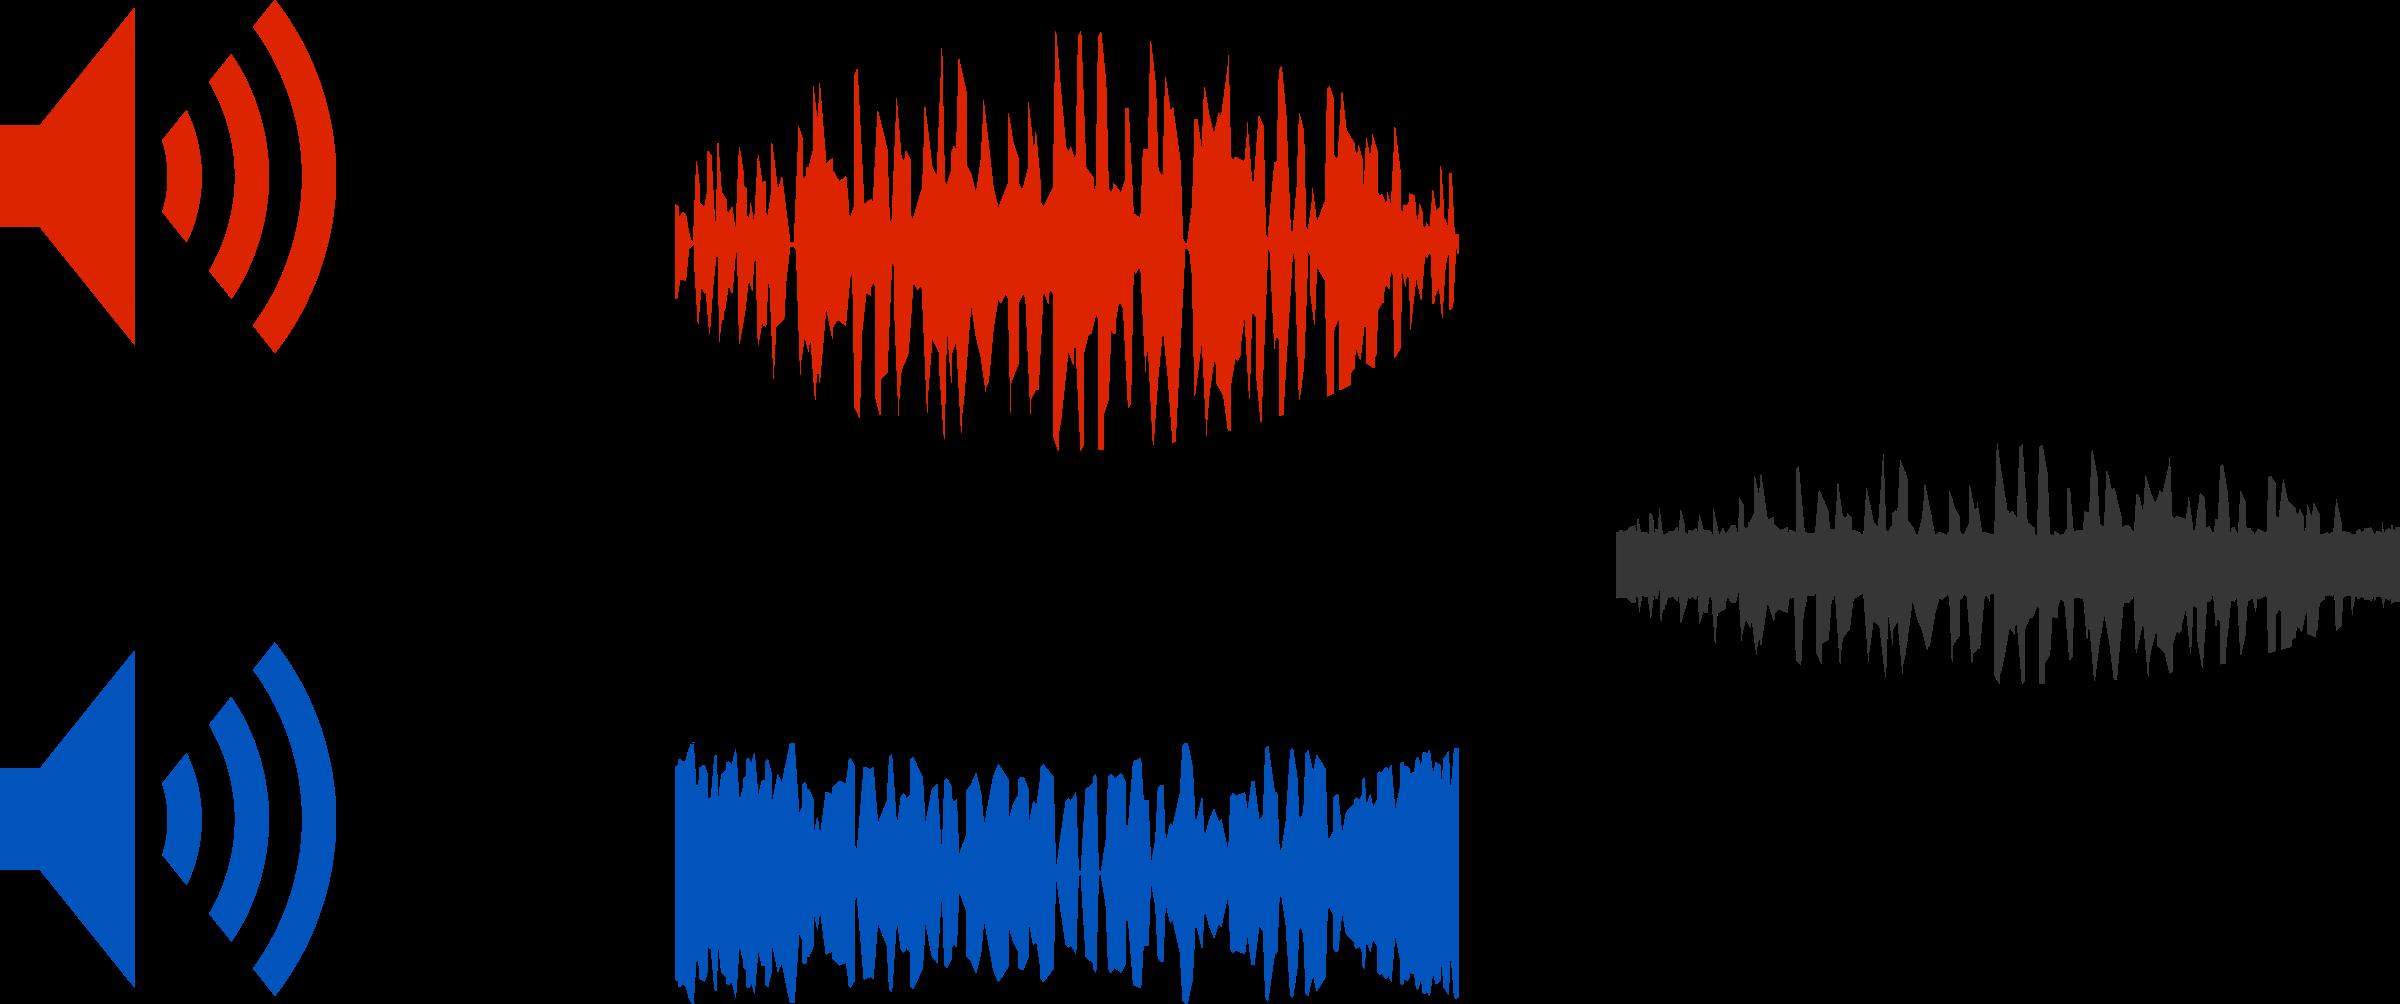 Noise panda free images. Drums clipart noisy